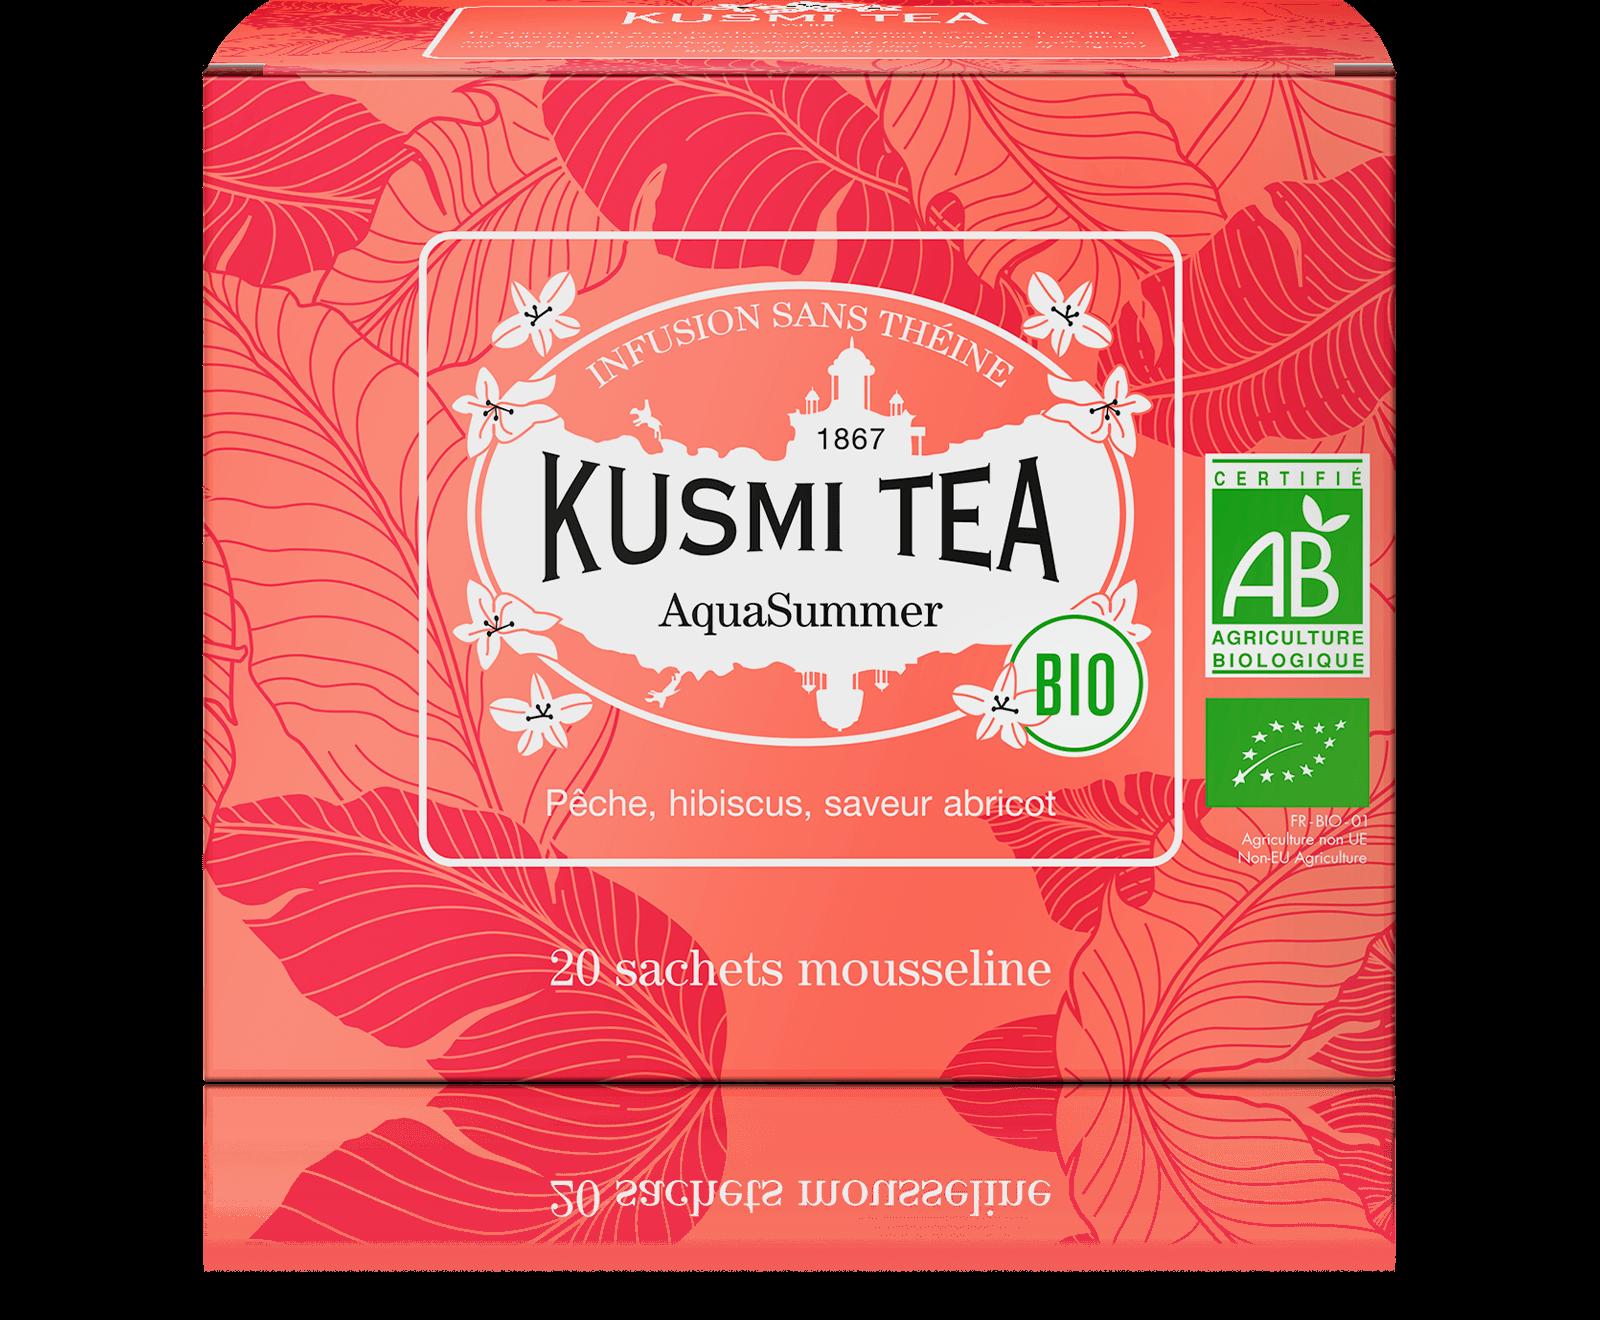 AquaSummer Infusion de fruits bio - Infusion hibiscus, pêche, abricot - Sachets de thé - Kusmi Tea